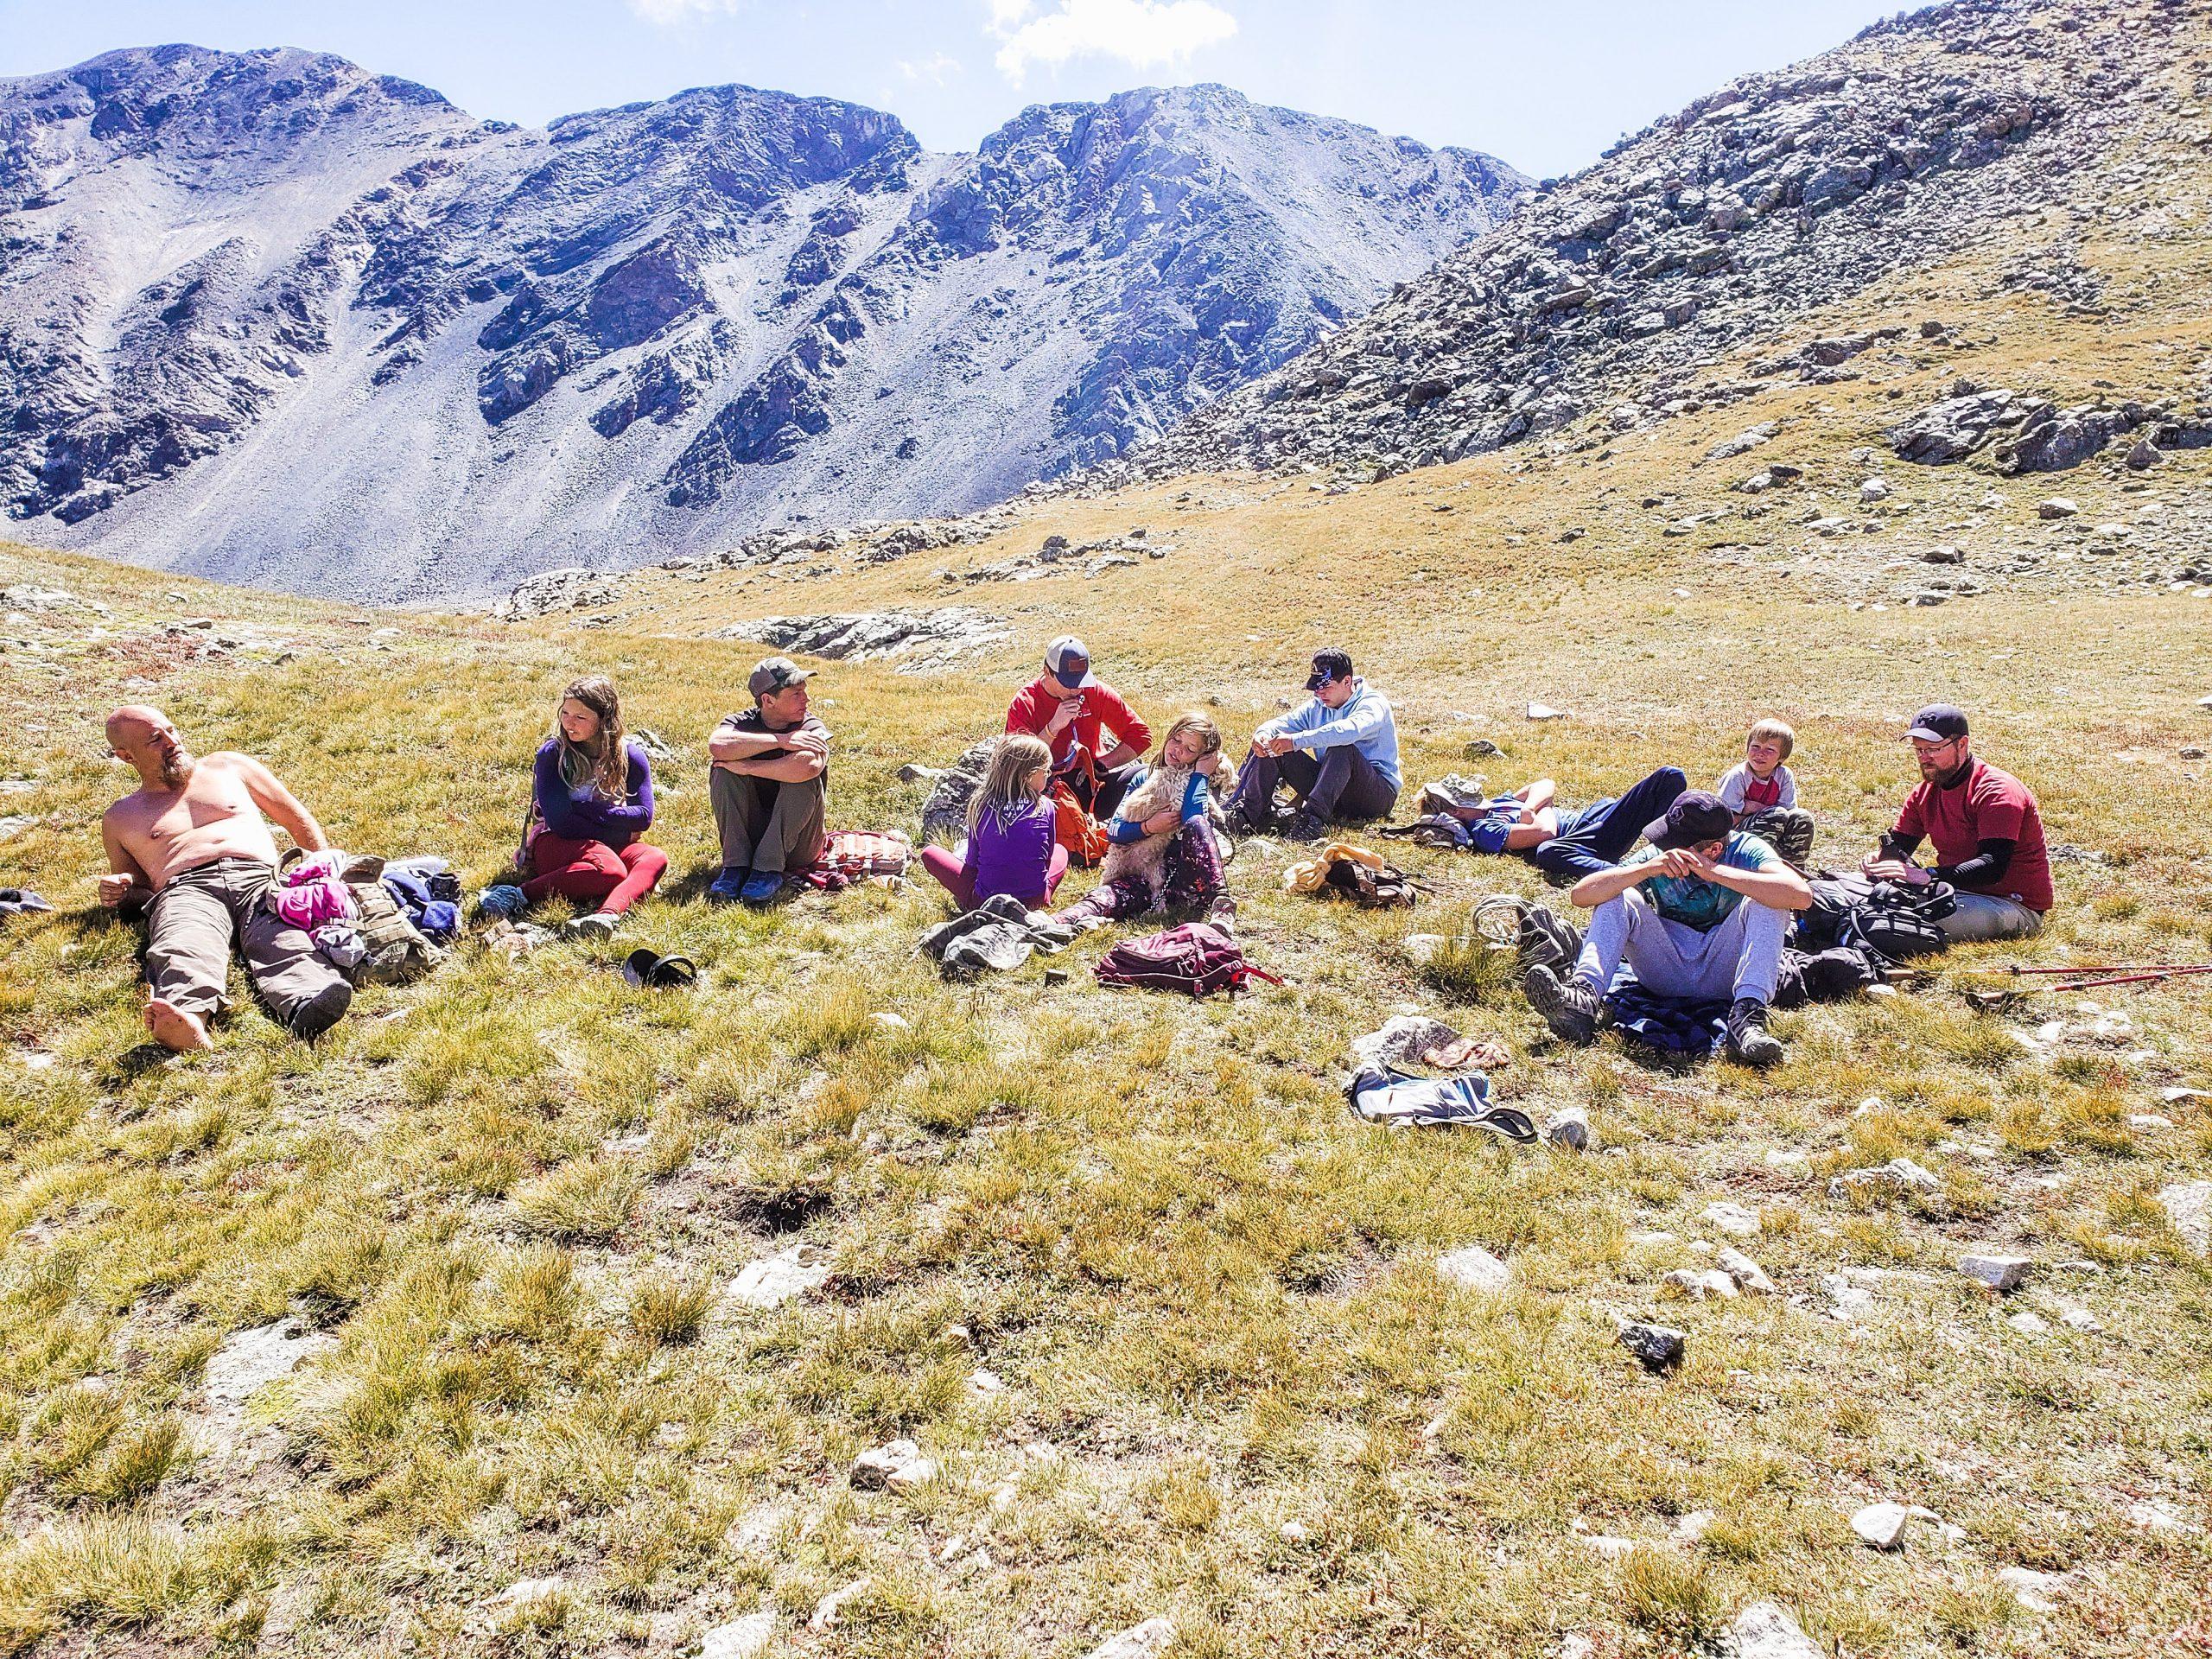 Hiking Grays and Torreys